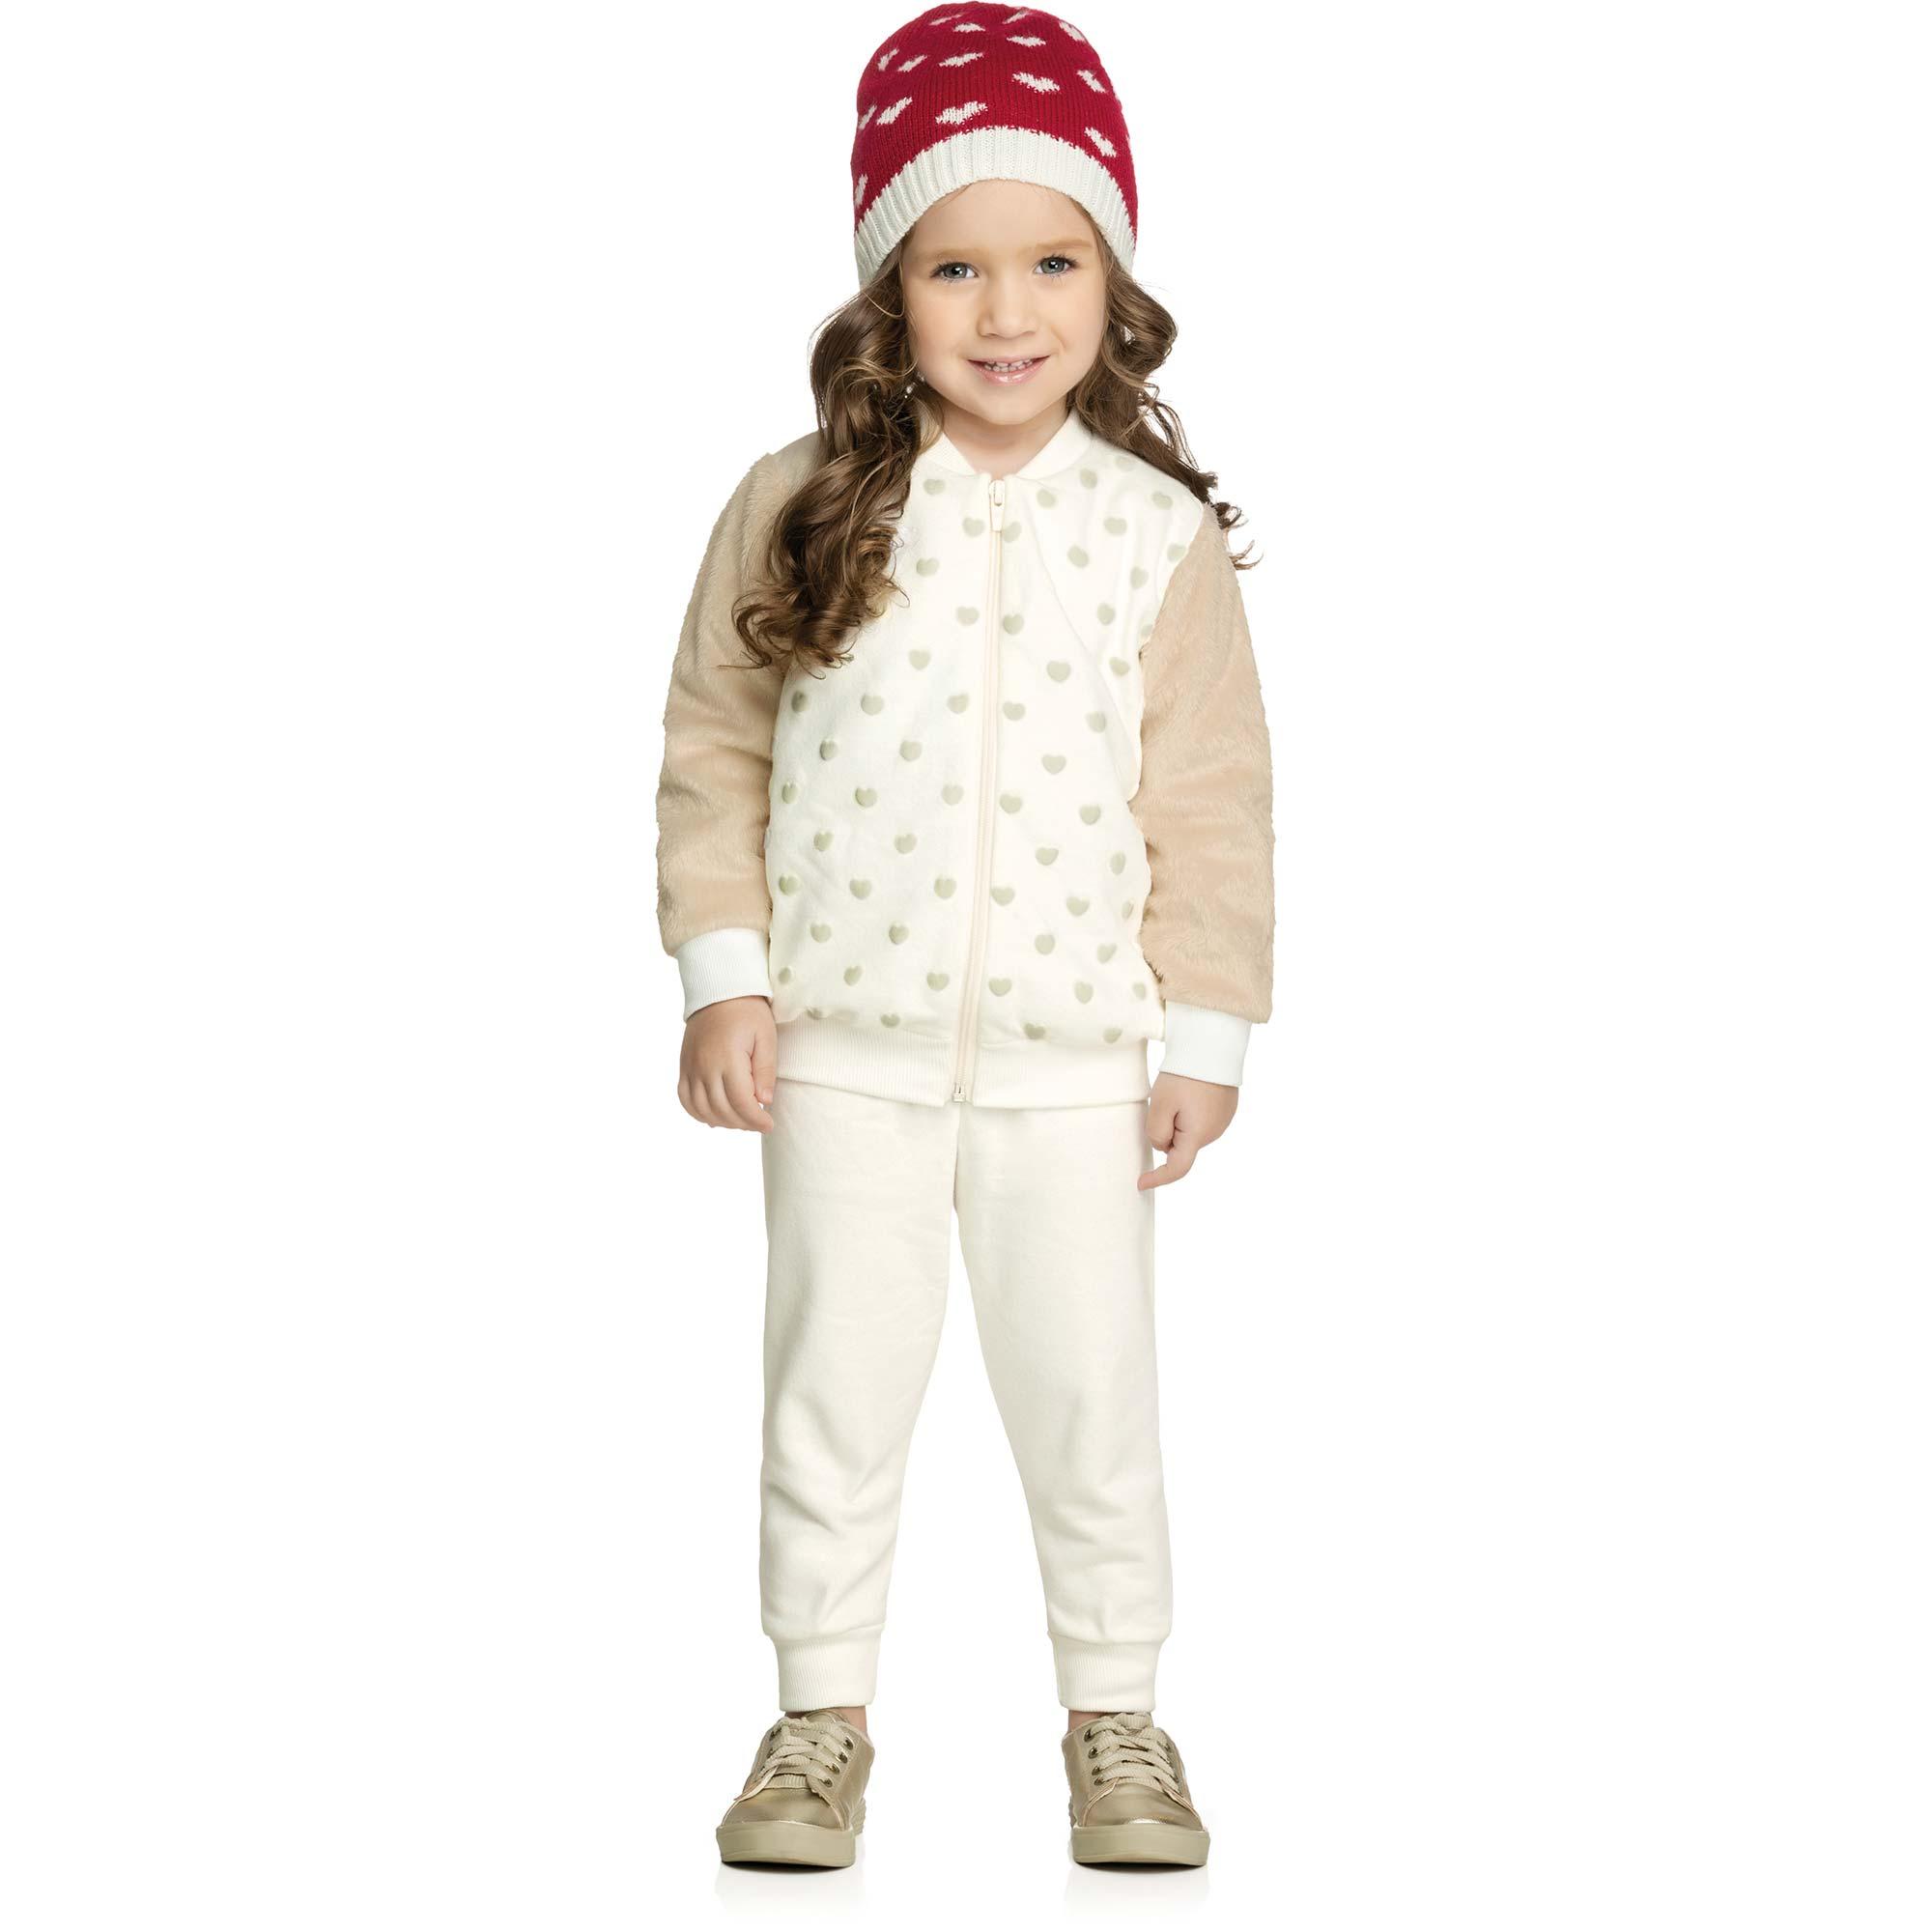 Conjunto Feminino Infantil Elian - Ref 231190 - Natural